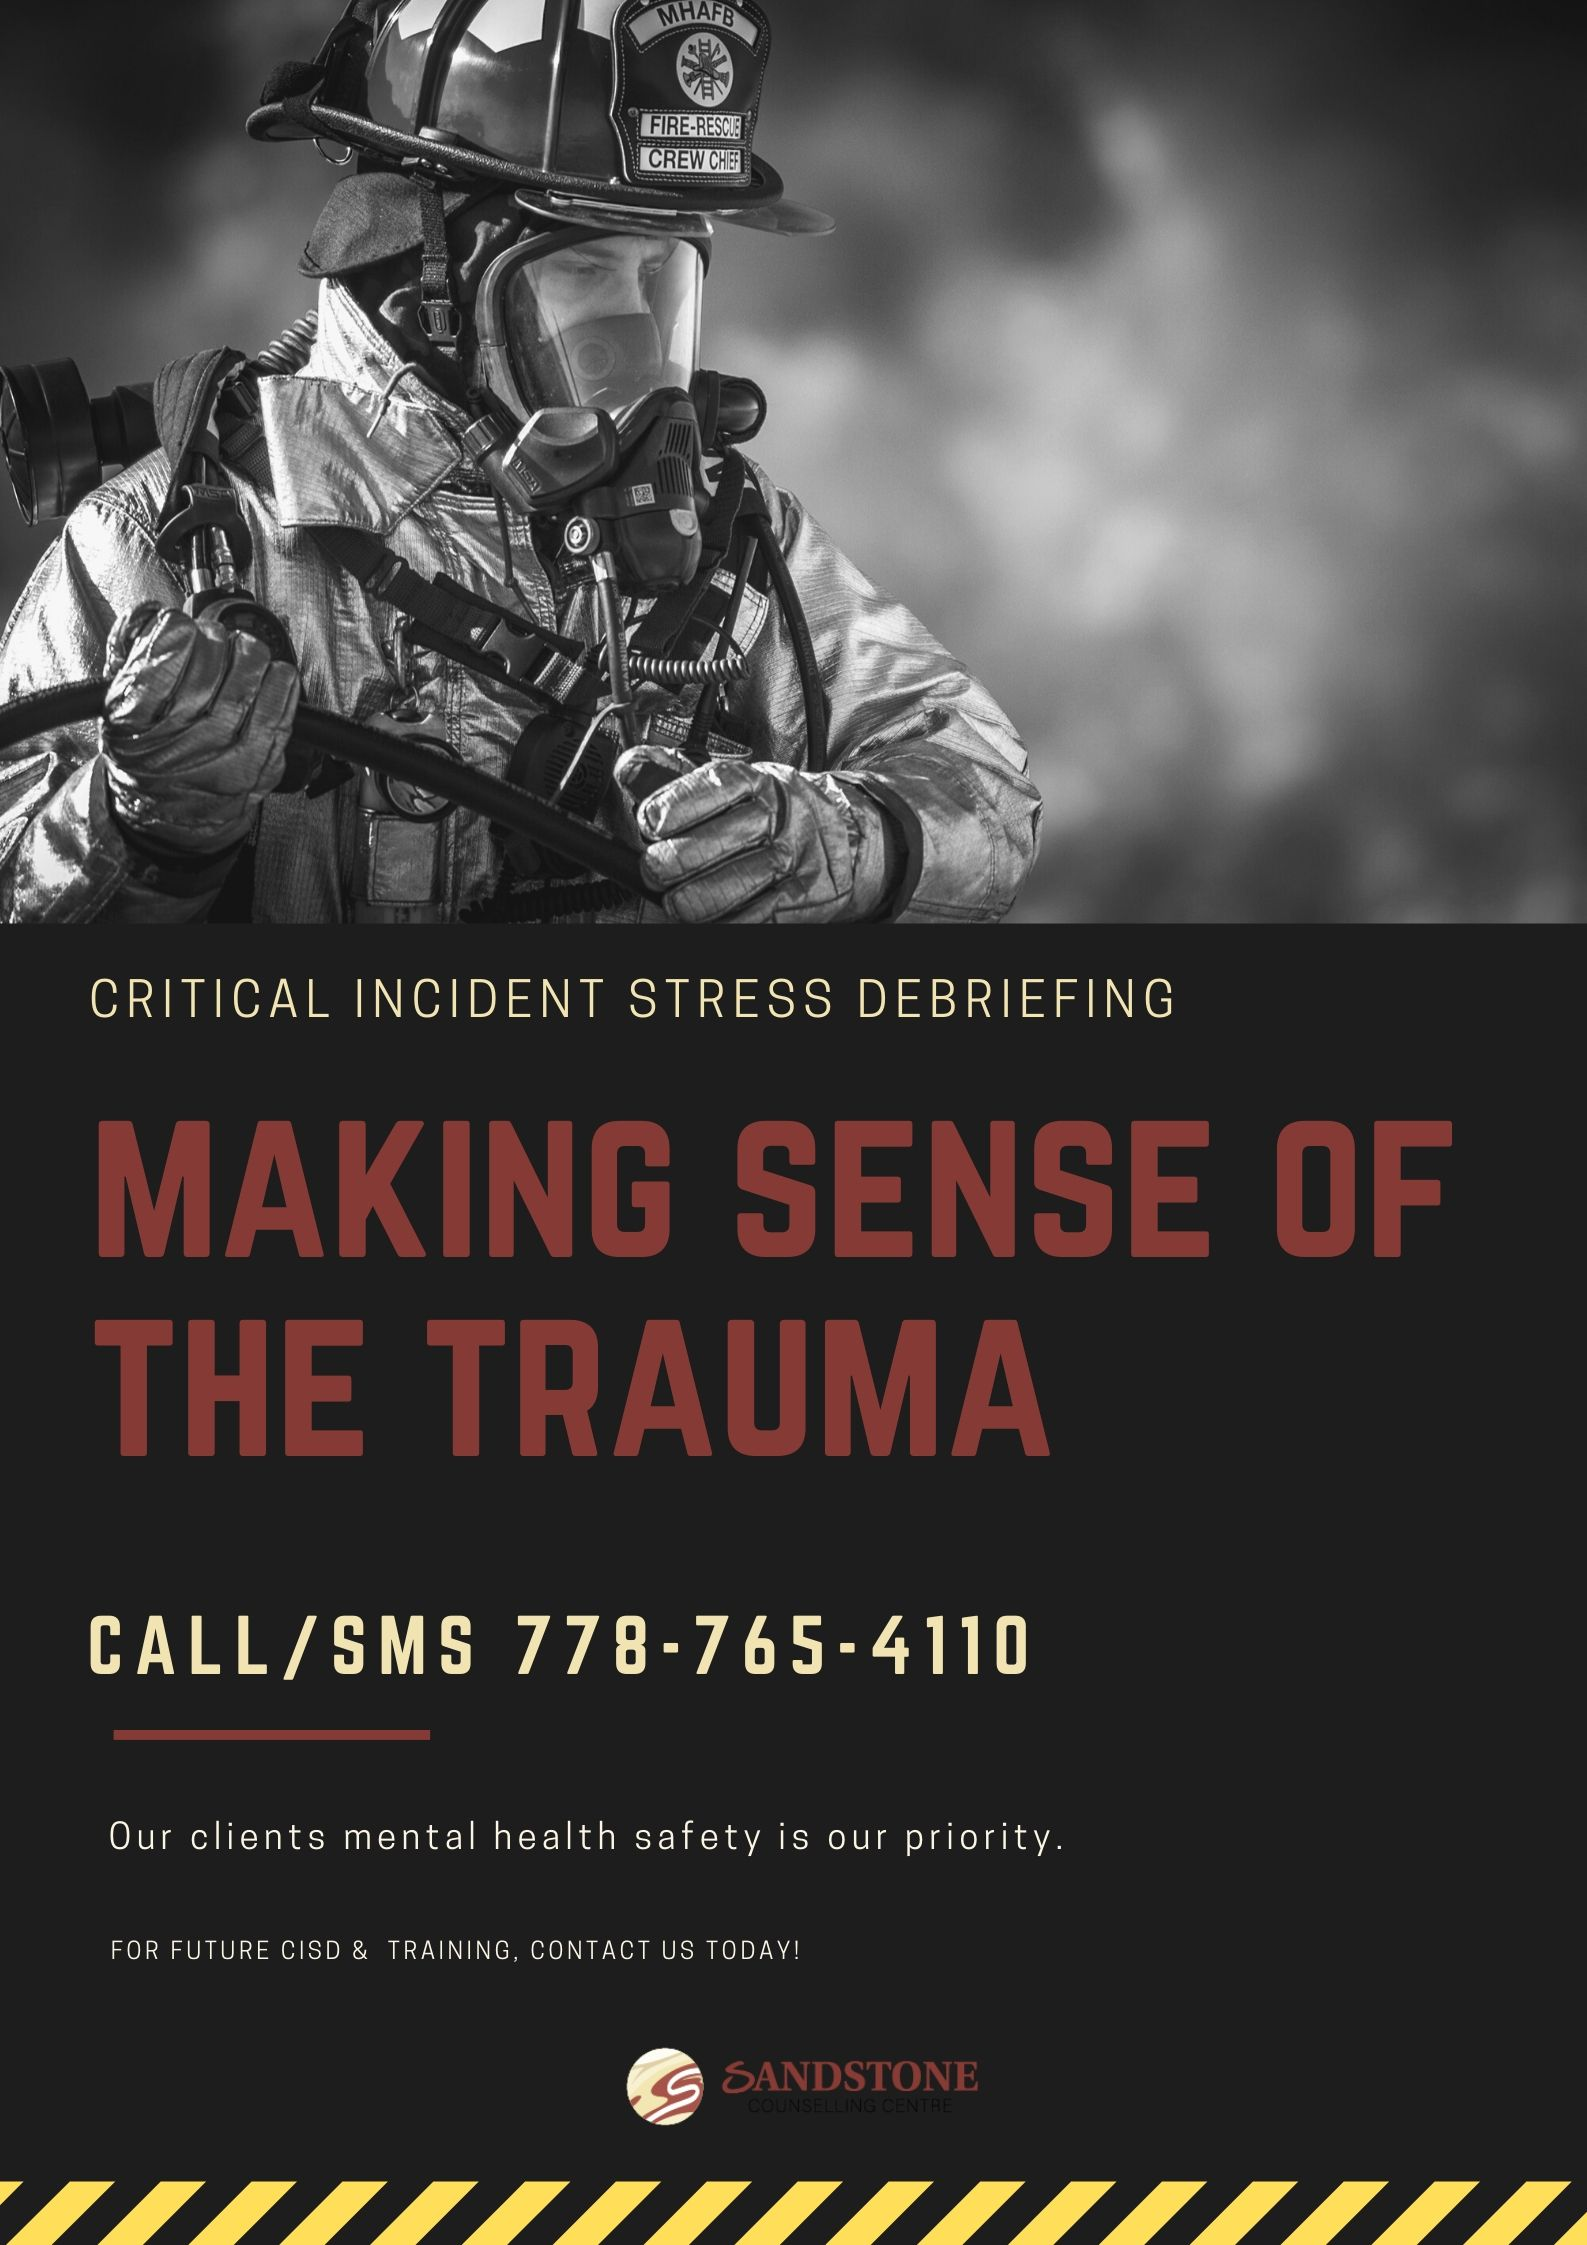 CSID CISM Trauma Crisis Counselling